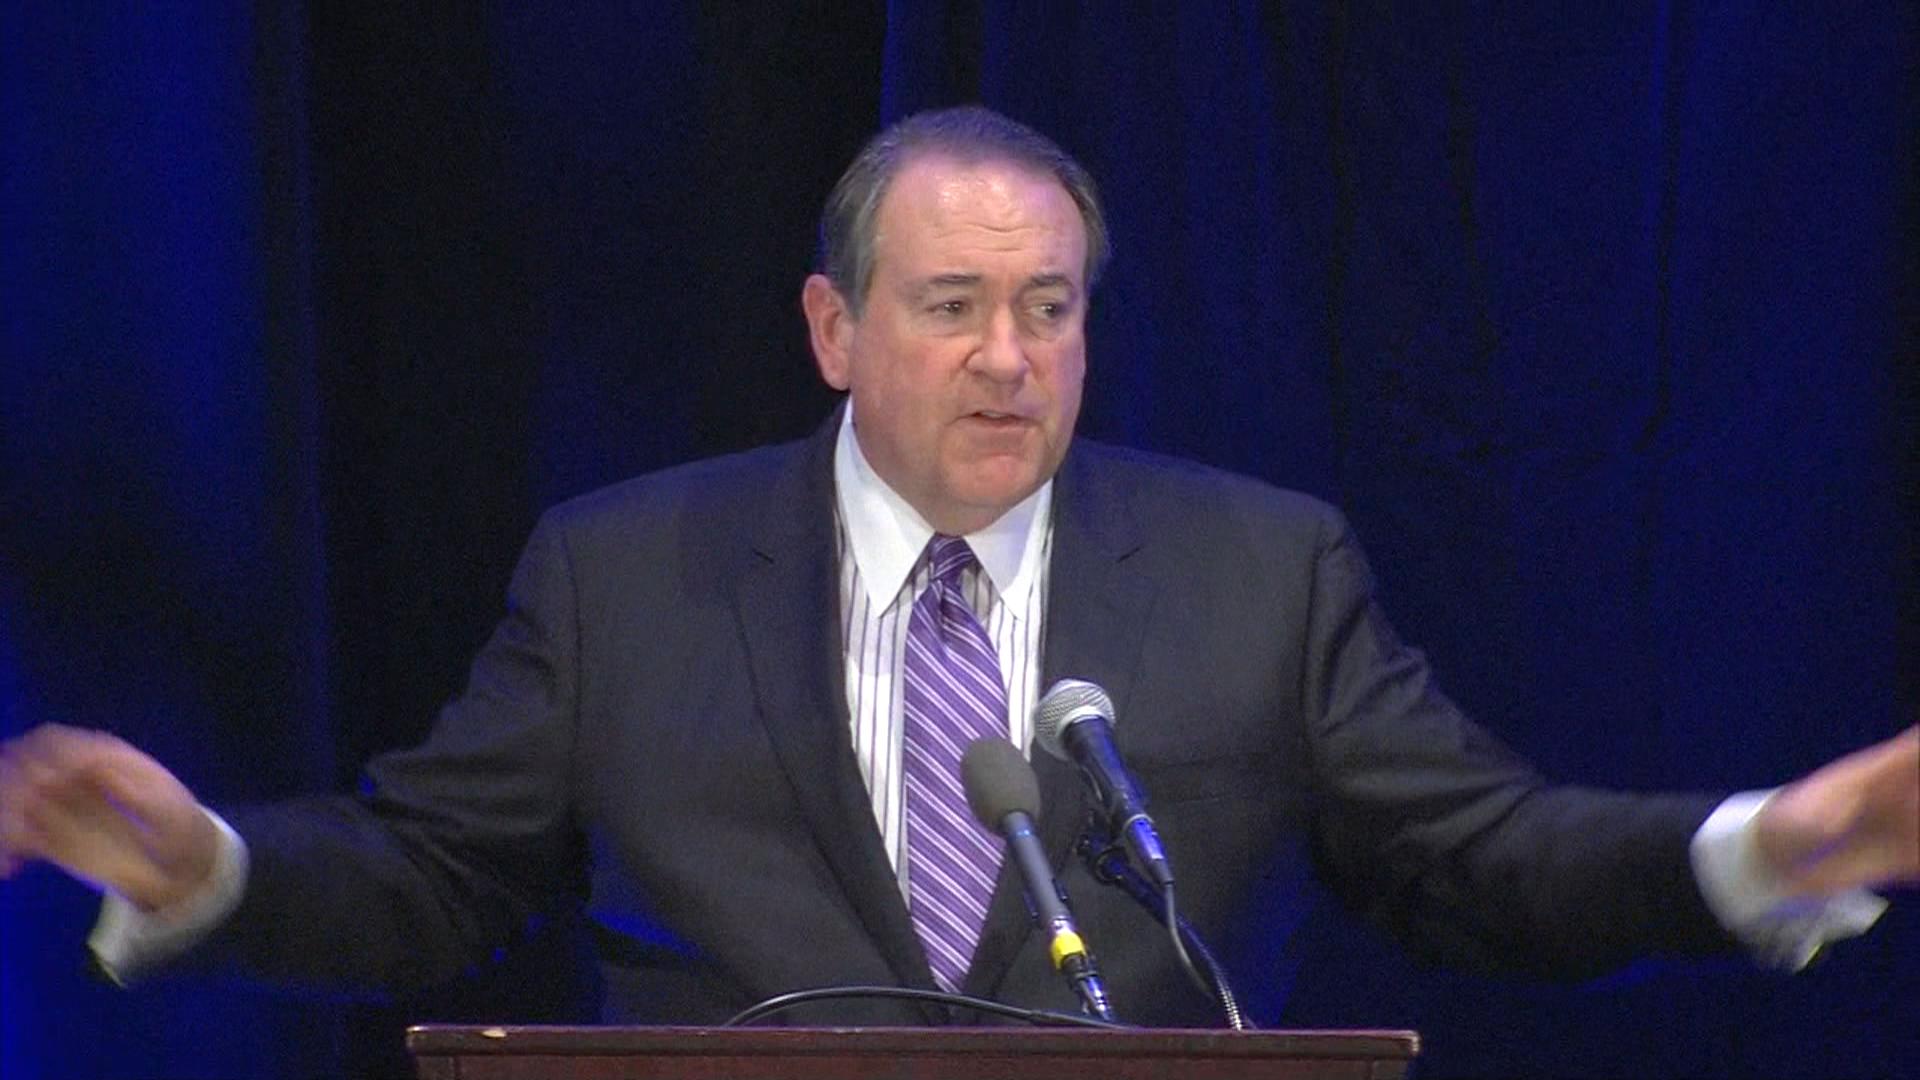 Huckabee revives GOP 'war on women'